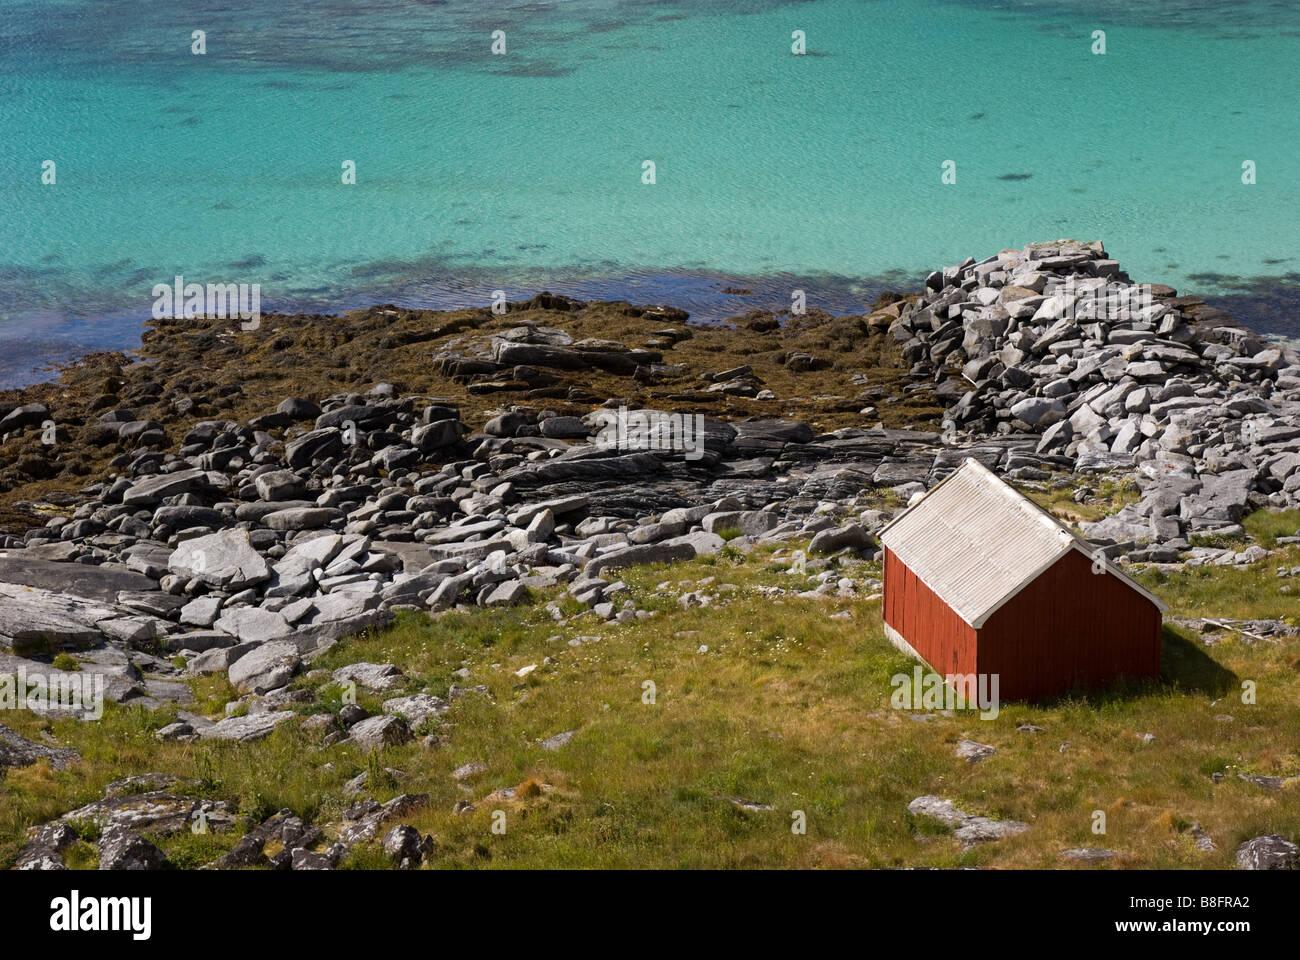 Lonely house halfway from Sørland to Nordland, Værøy, Lofoten, Nordland, Norway, Scandinavia - Stock Image